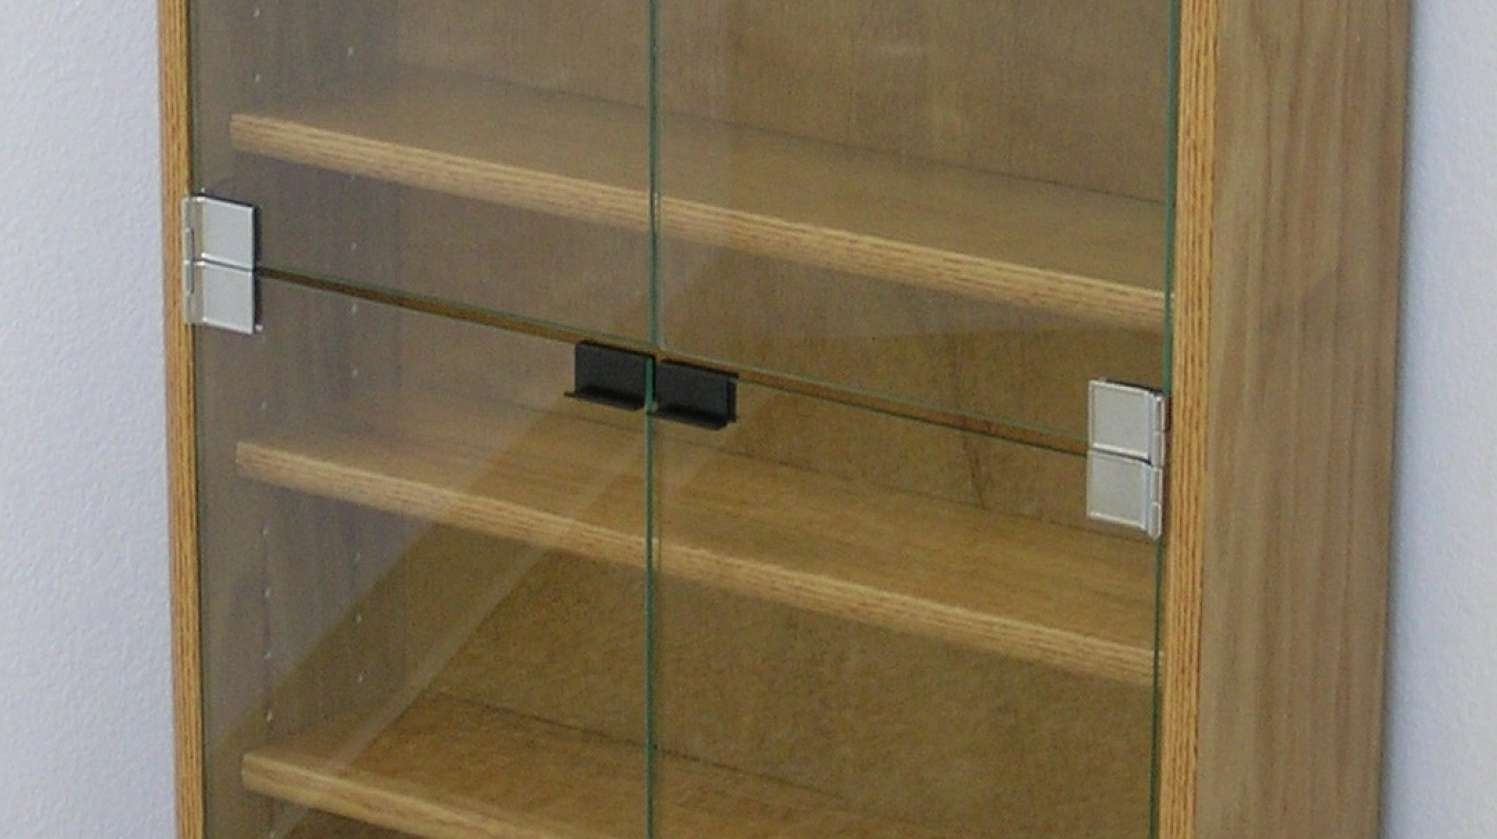 Tv : Fascinate Maple Oak Tv Stand Frightening Maple Oak Tv Stand Inside Maple Wood Tv Stands (View 10 of 15)